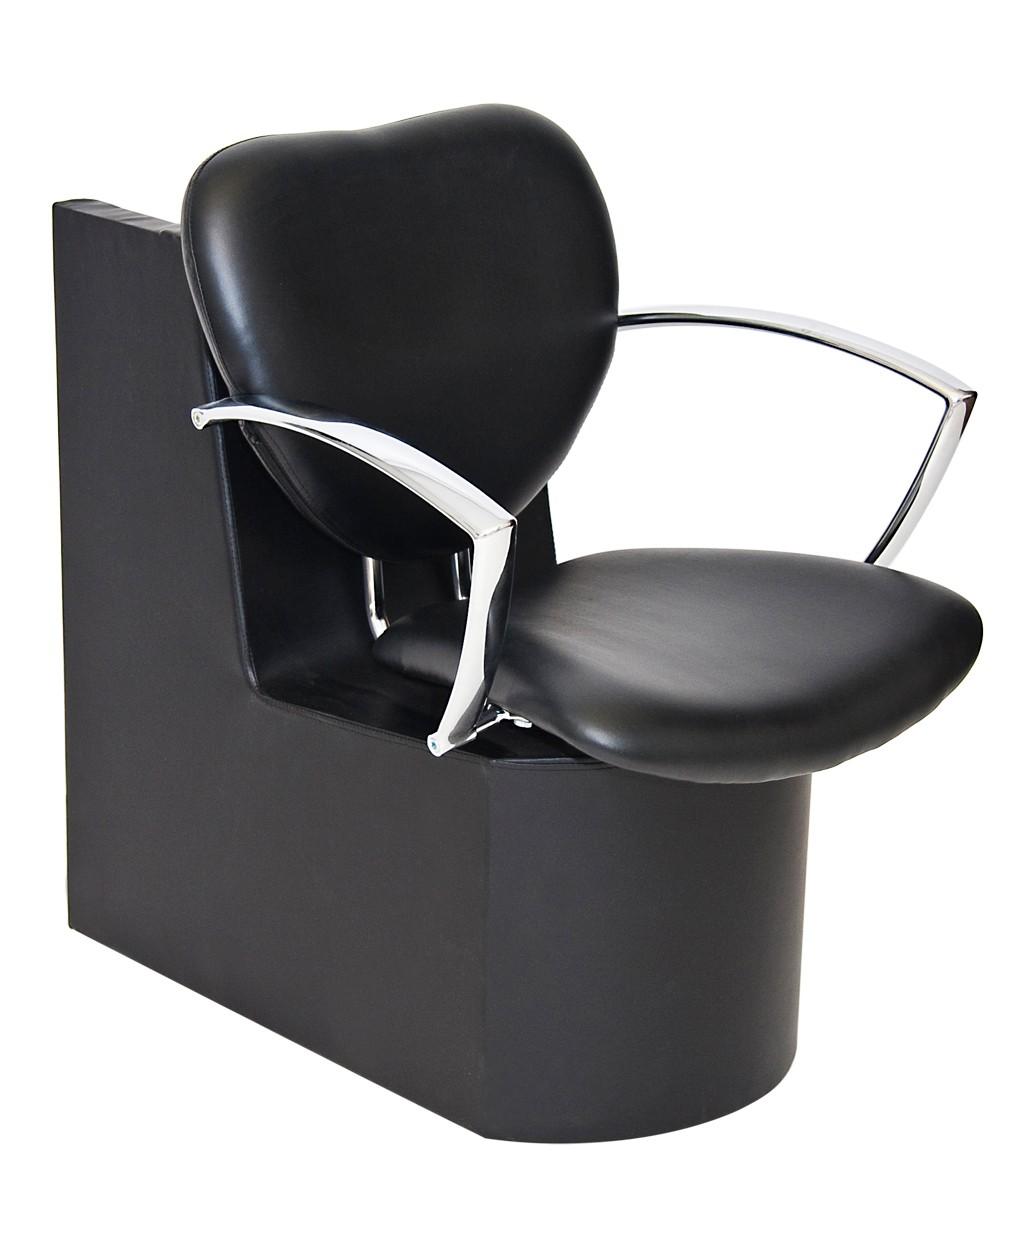 Chea Dryer Chair